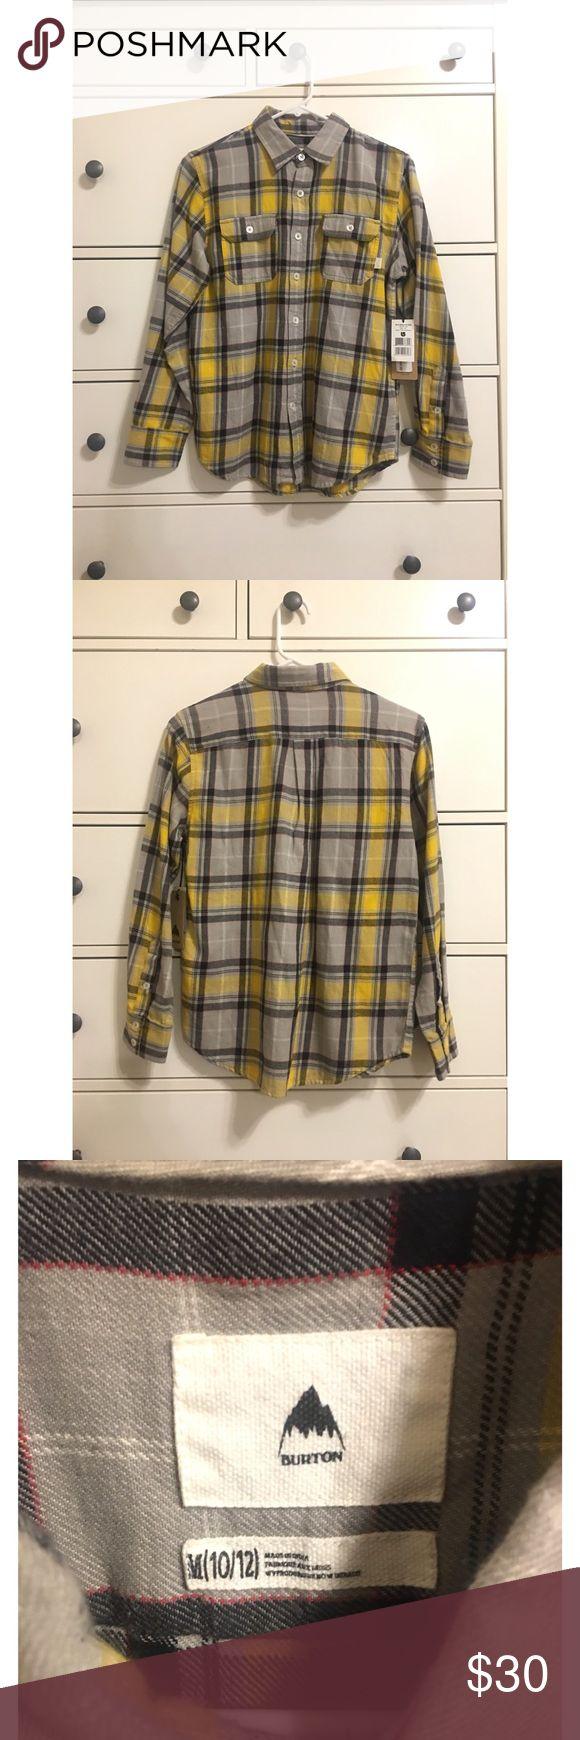 New Burton Boys Shirt Medium New with tags Burton Boys Brighton long sleeve shirt- Gold & Gray Size: Medium (10/12)  100% cotton Original price $49 Burton Shirts & Tops Button Down Shirts